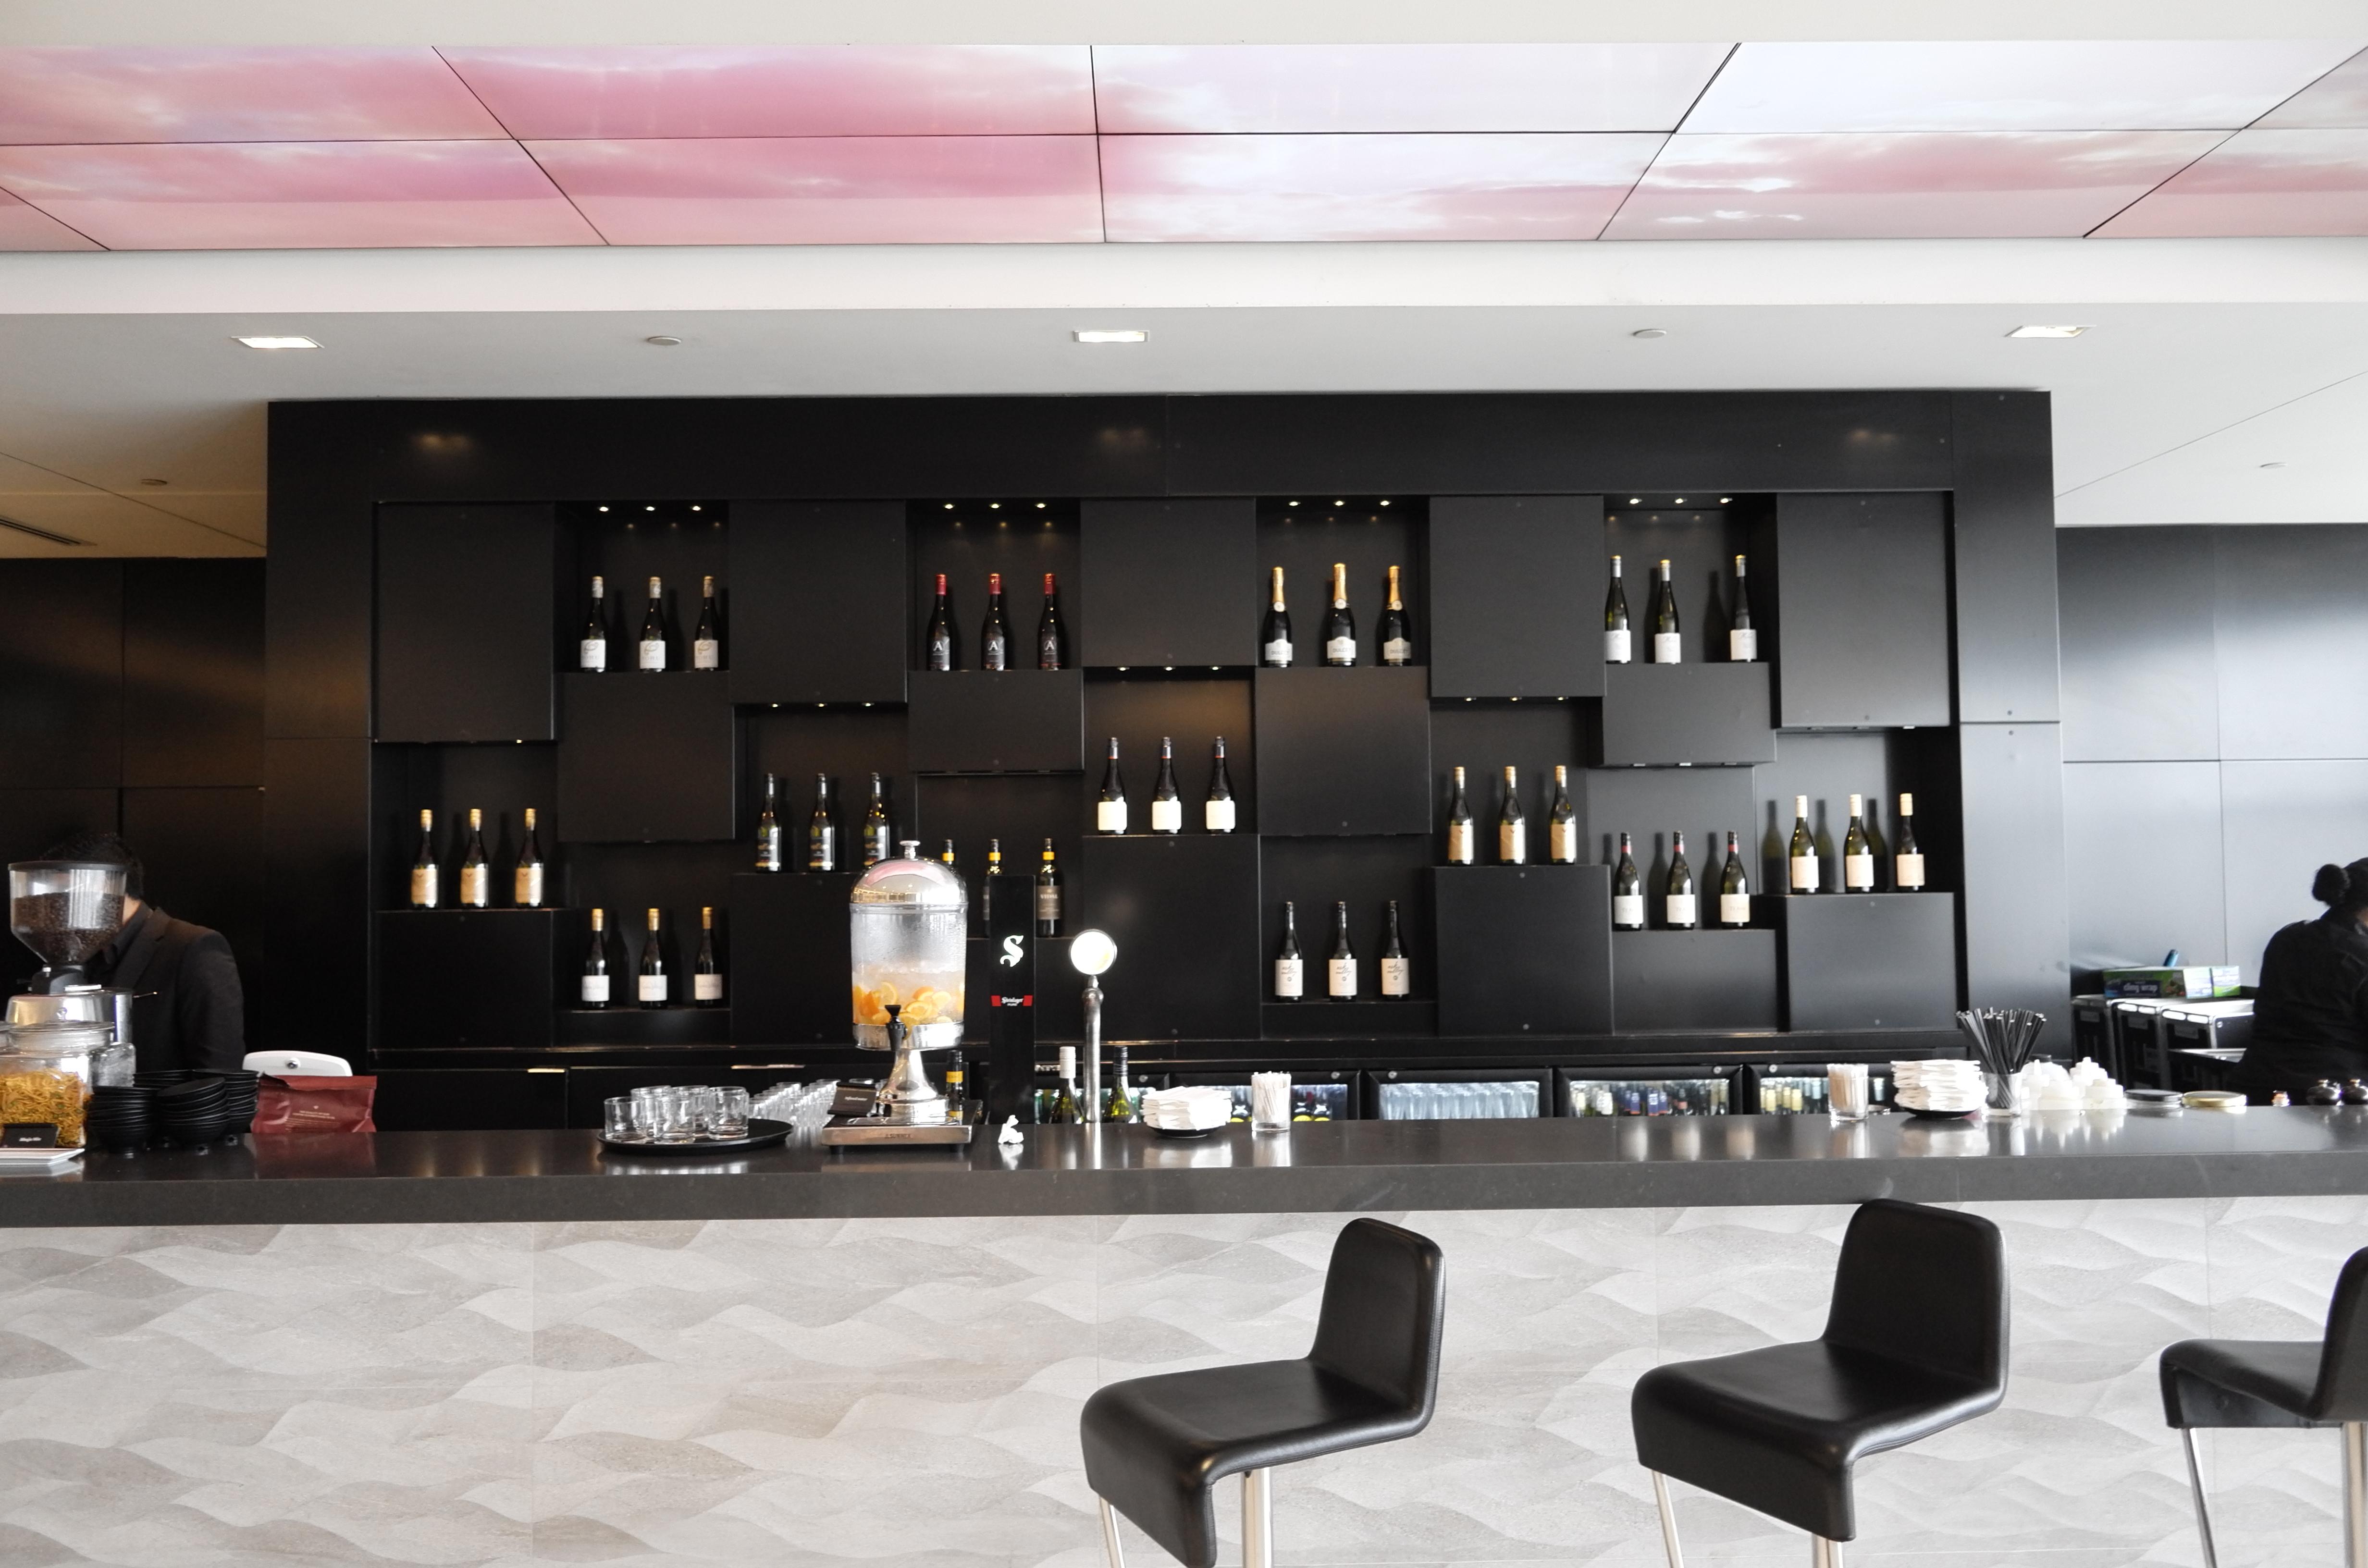 Lounge Review : オークランド空港(AKL) ニュージーランド航空(NZ) インターナショナルラウンジ(International Lounge)